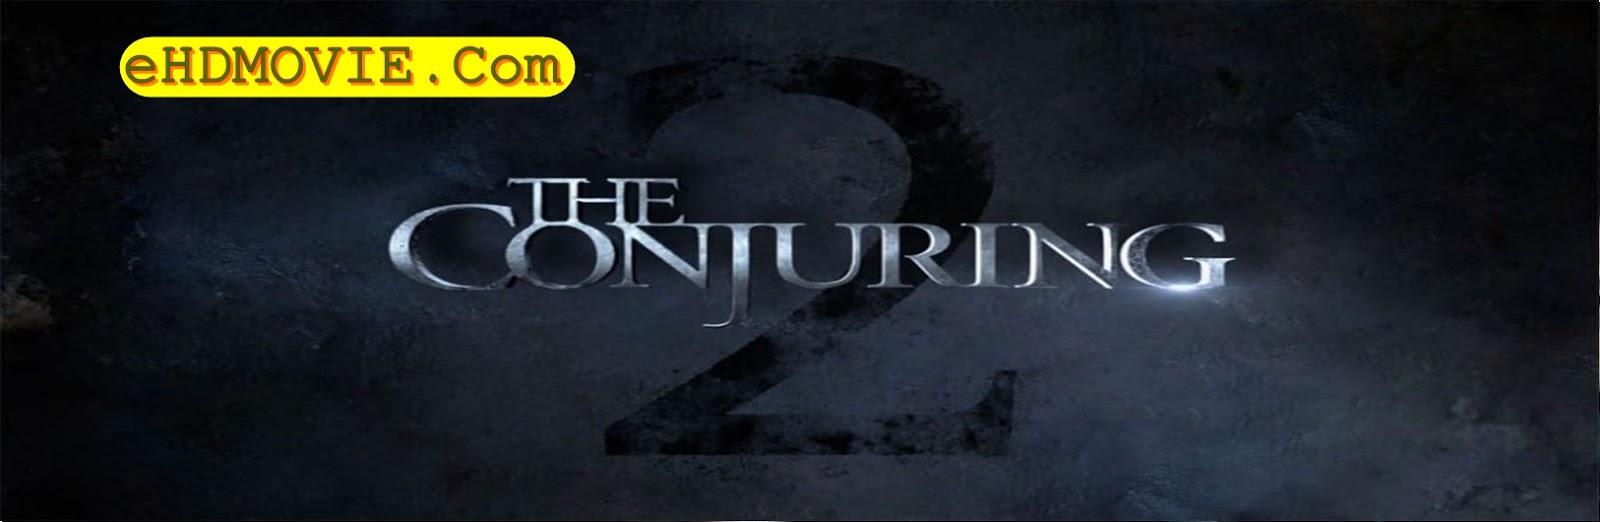 The Conjuring 2 2016 Full Movie Dual Audio [Hindi – English] 720p - 480p ORG BRRip 400MB - 1GB ESubs Free Download